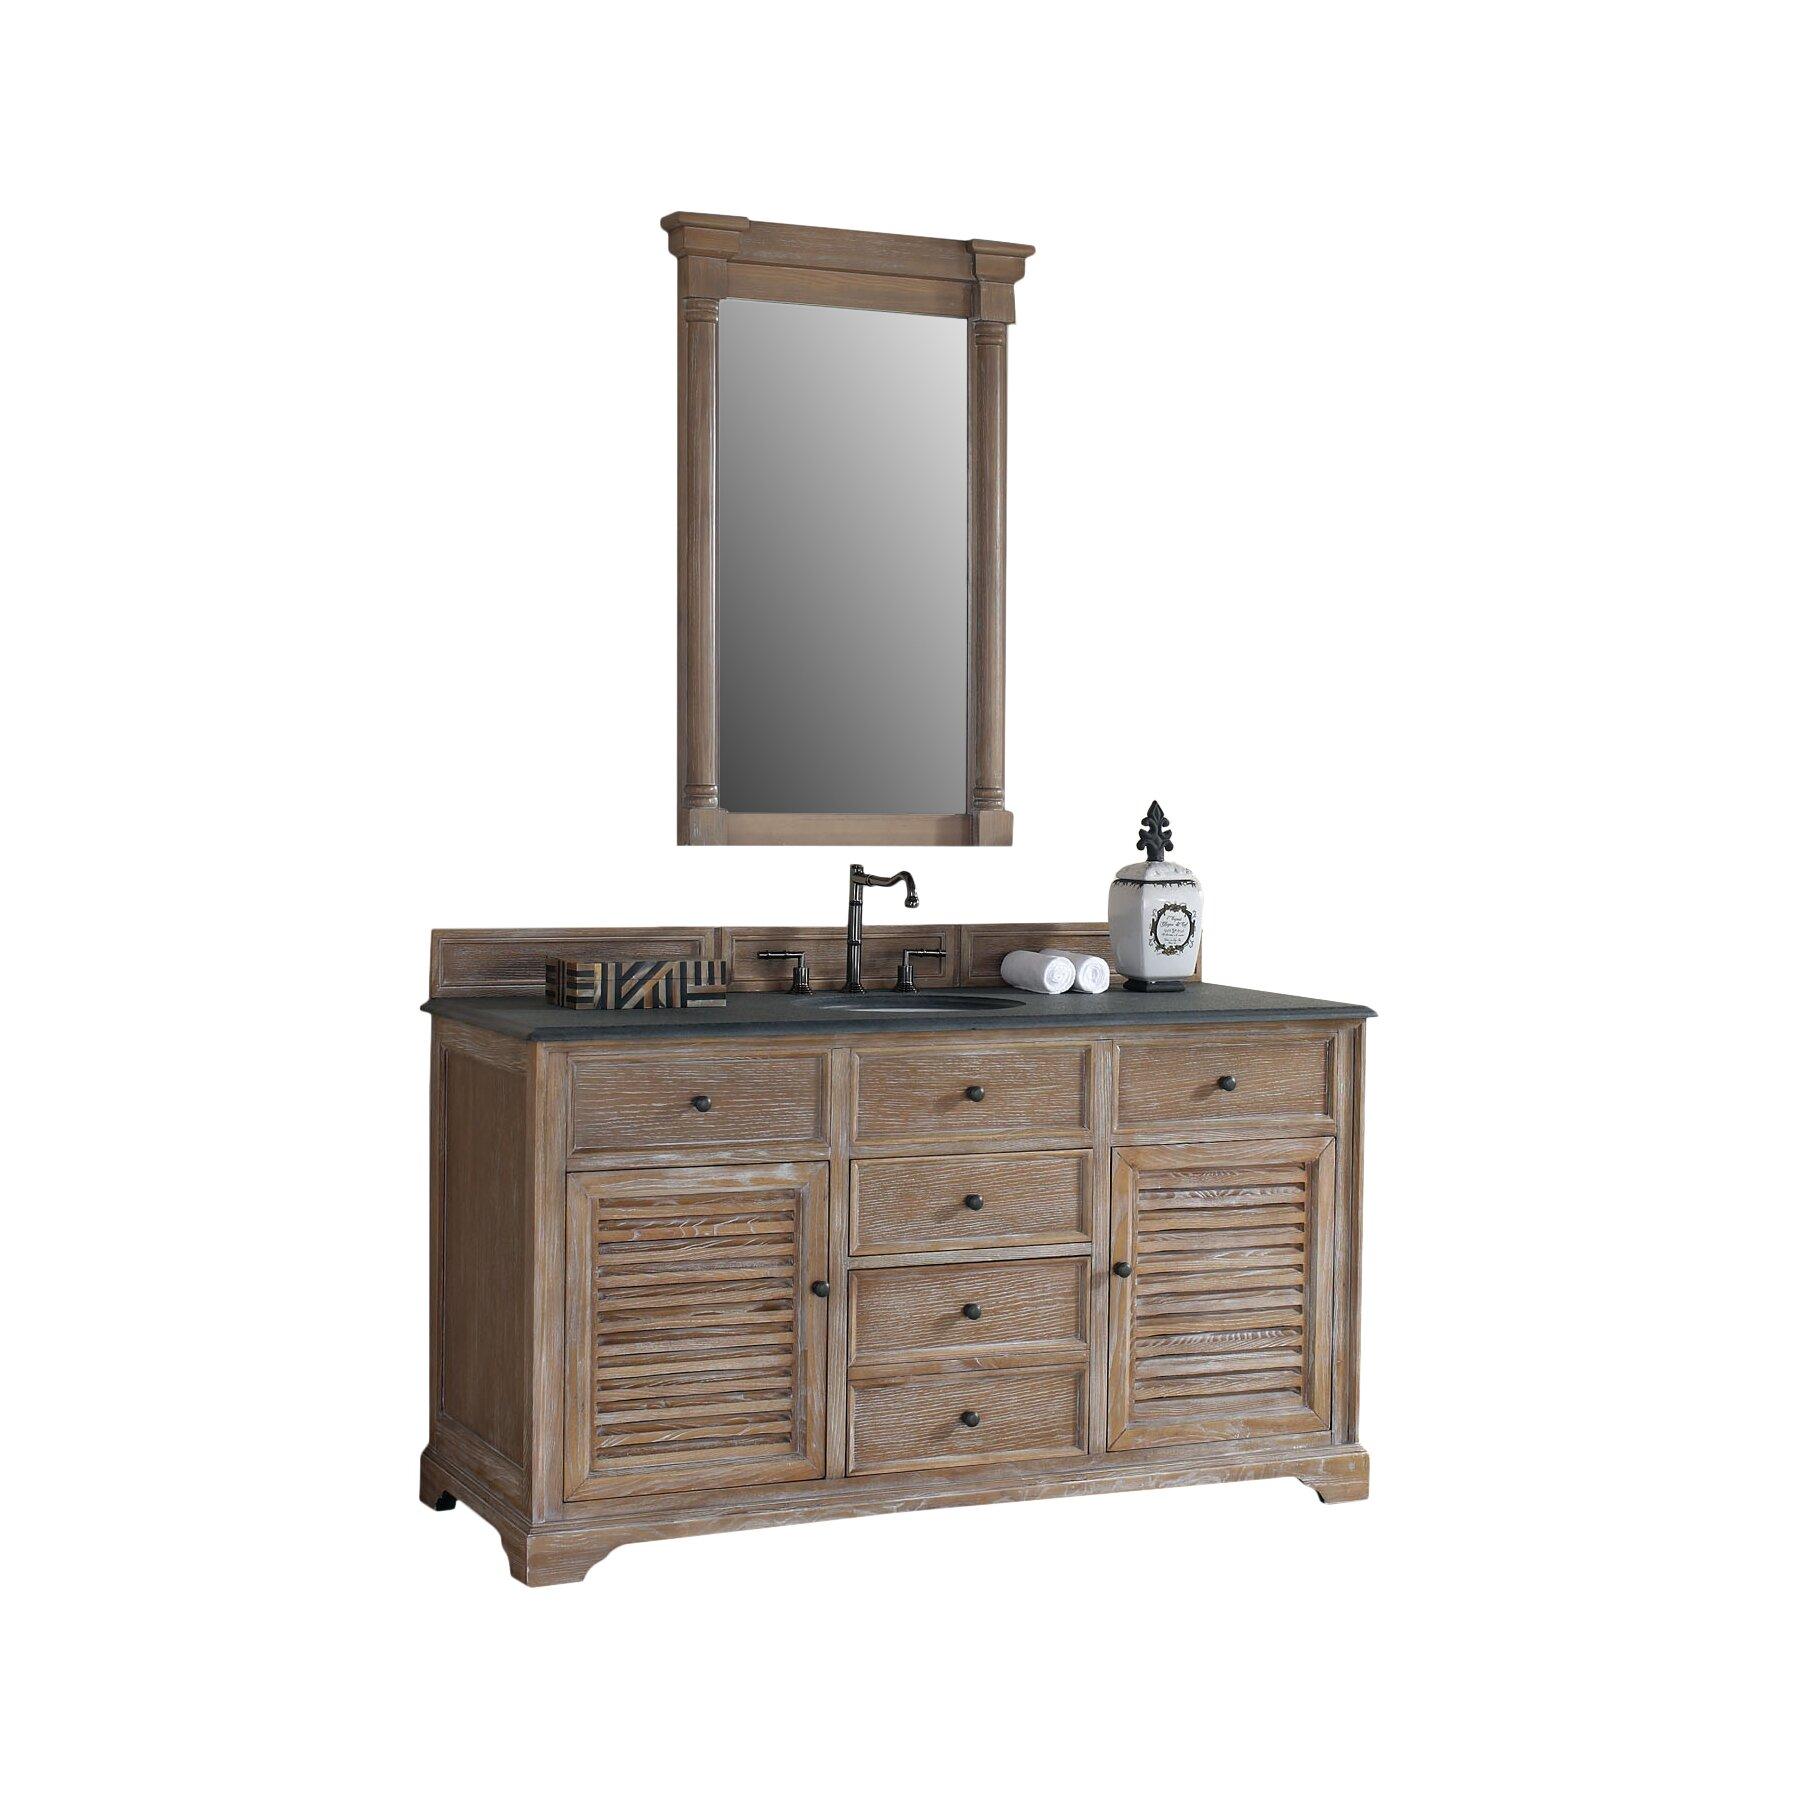 James Martin Furniture Savannah 60 Single Bathroom Vanity Base Reviews Wayfair